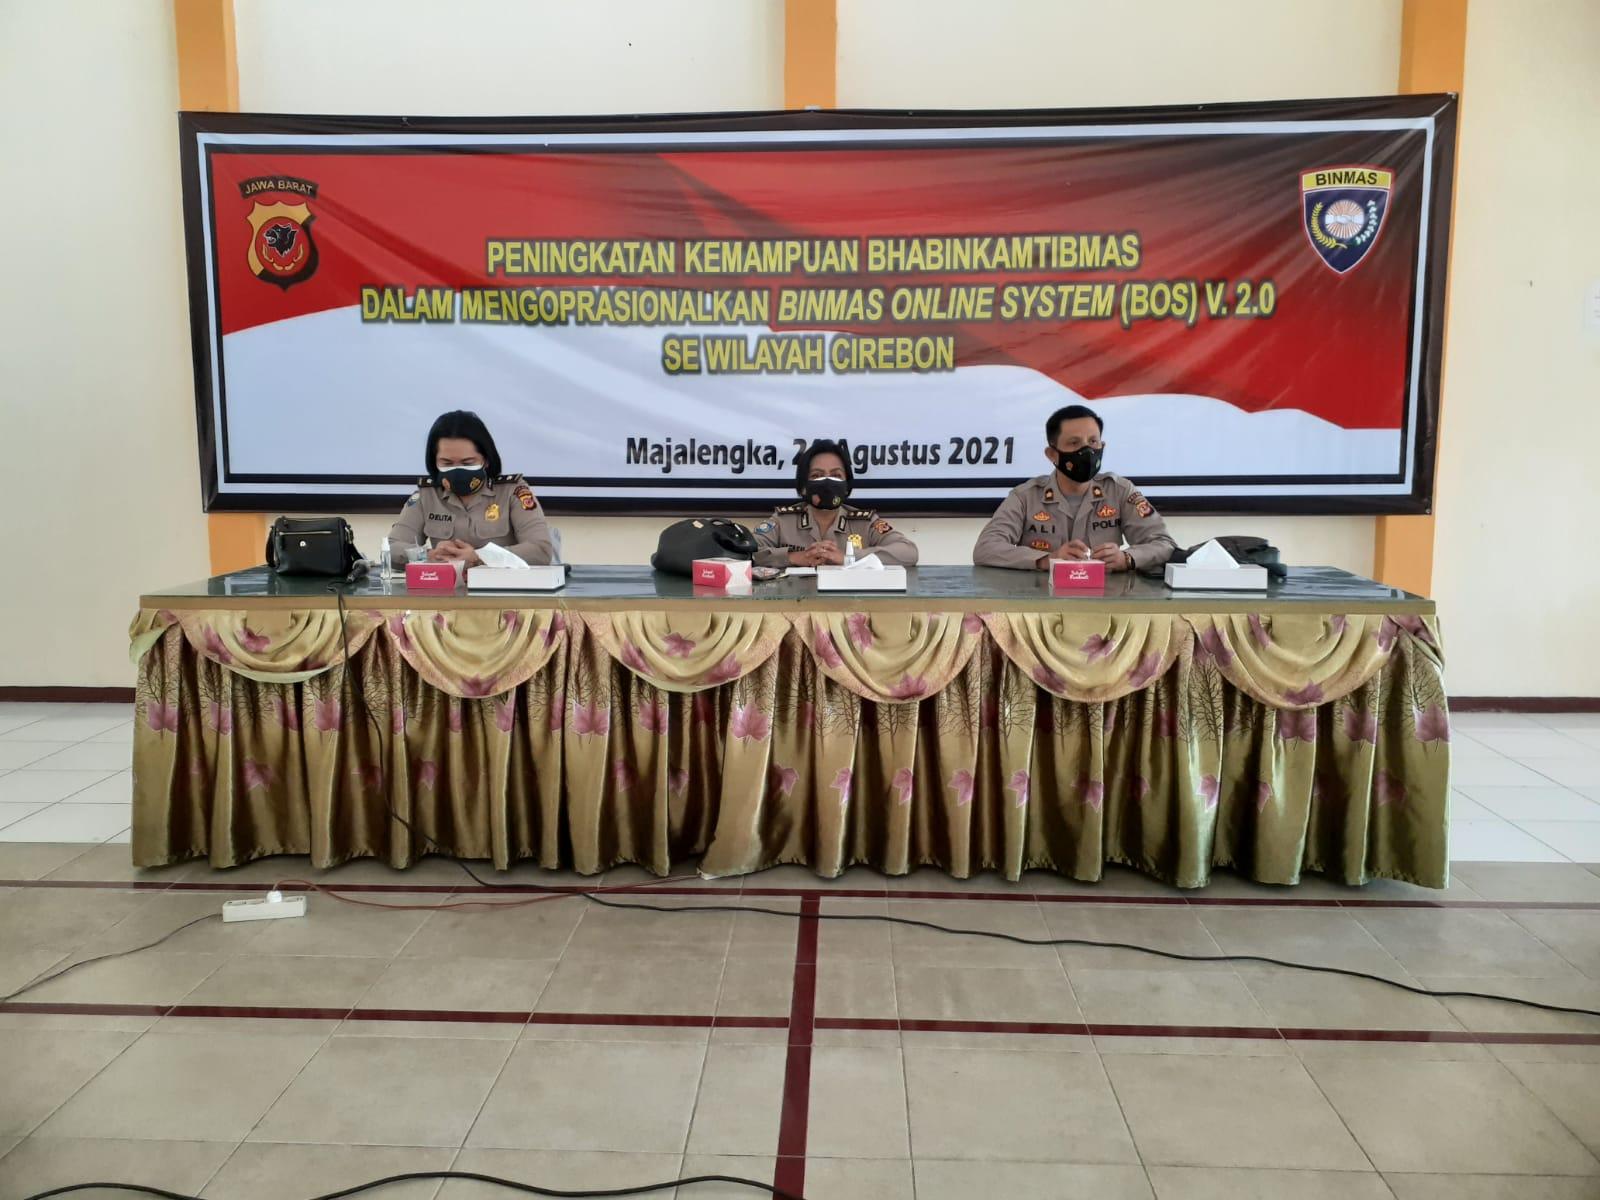 Ditbinmas Polda Jabar Gelar Pelatihan Binmas Online System (BOS) Versi 2.0 di Majalengka